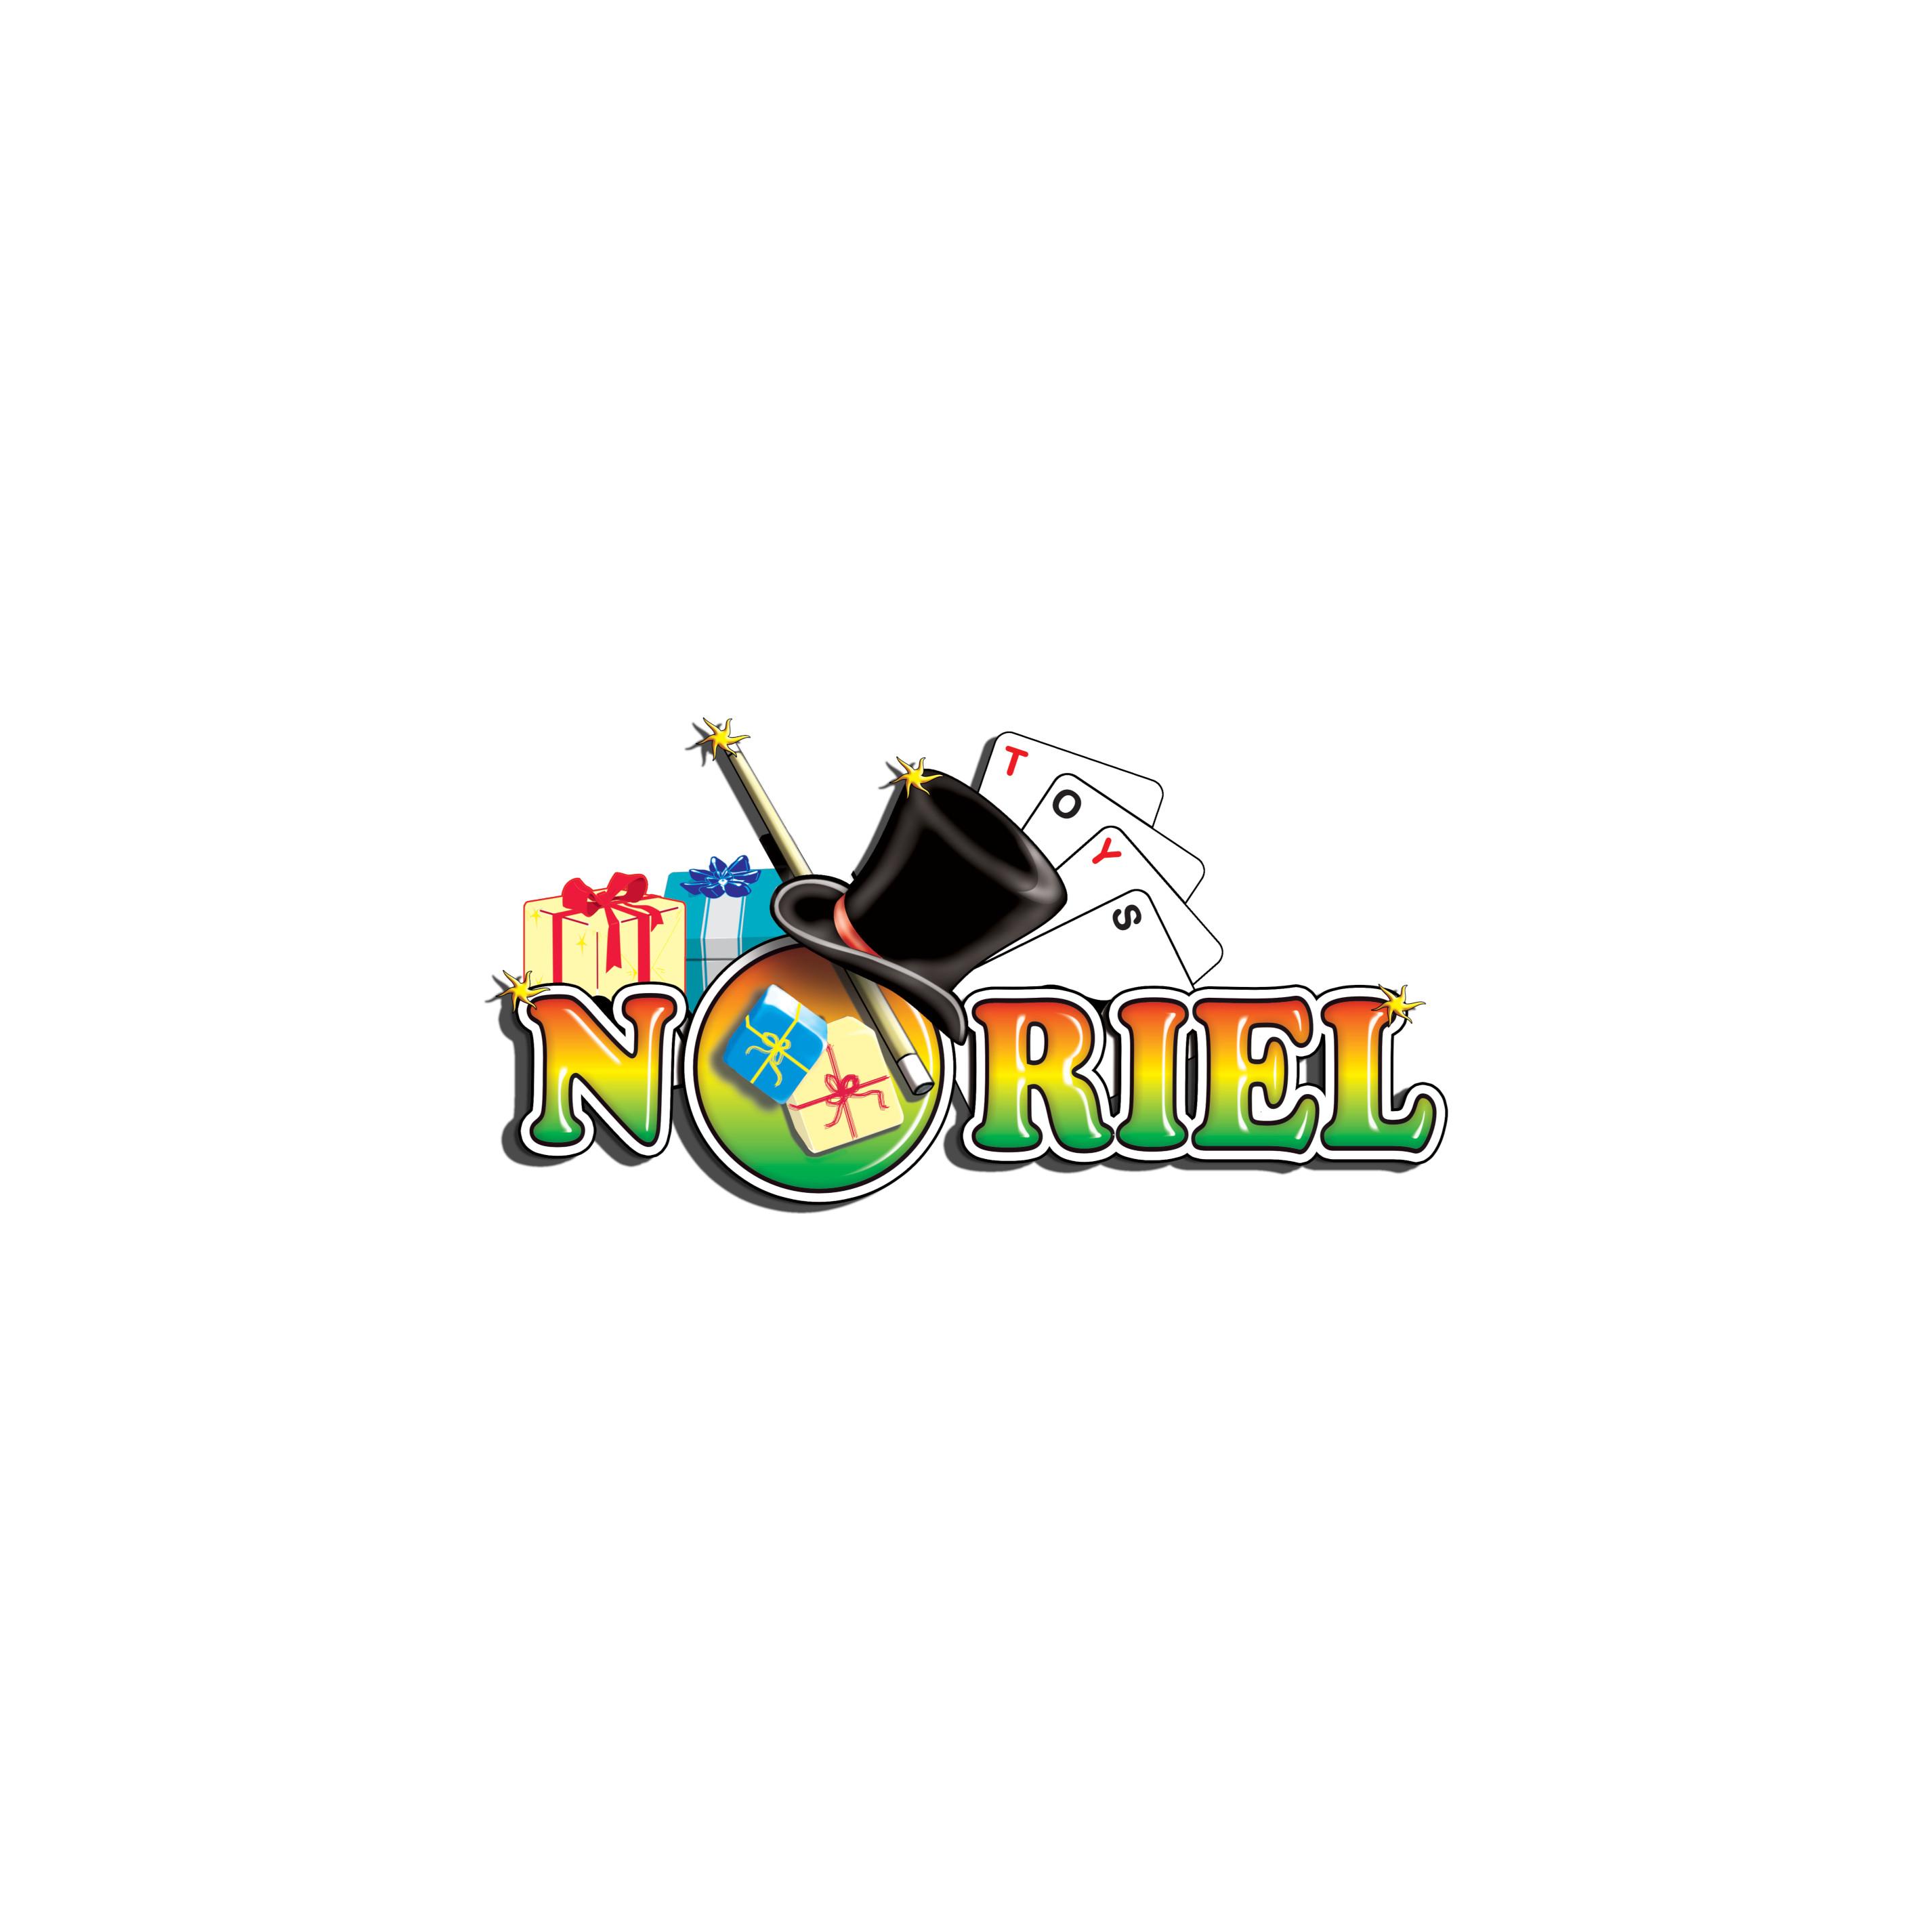 HP015TS_001w Casti audio cu fir pliabile, Toy Story 4